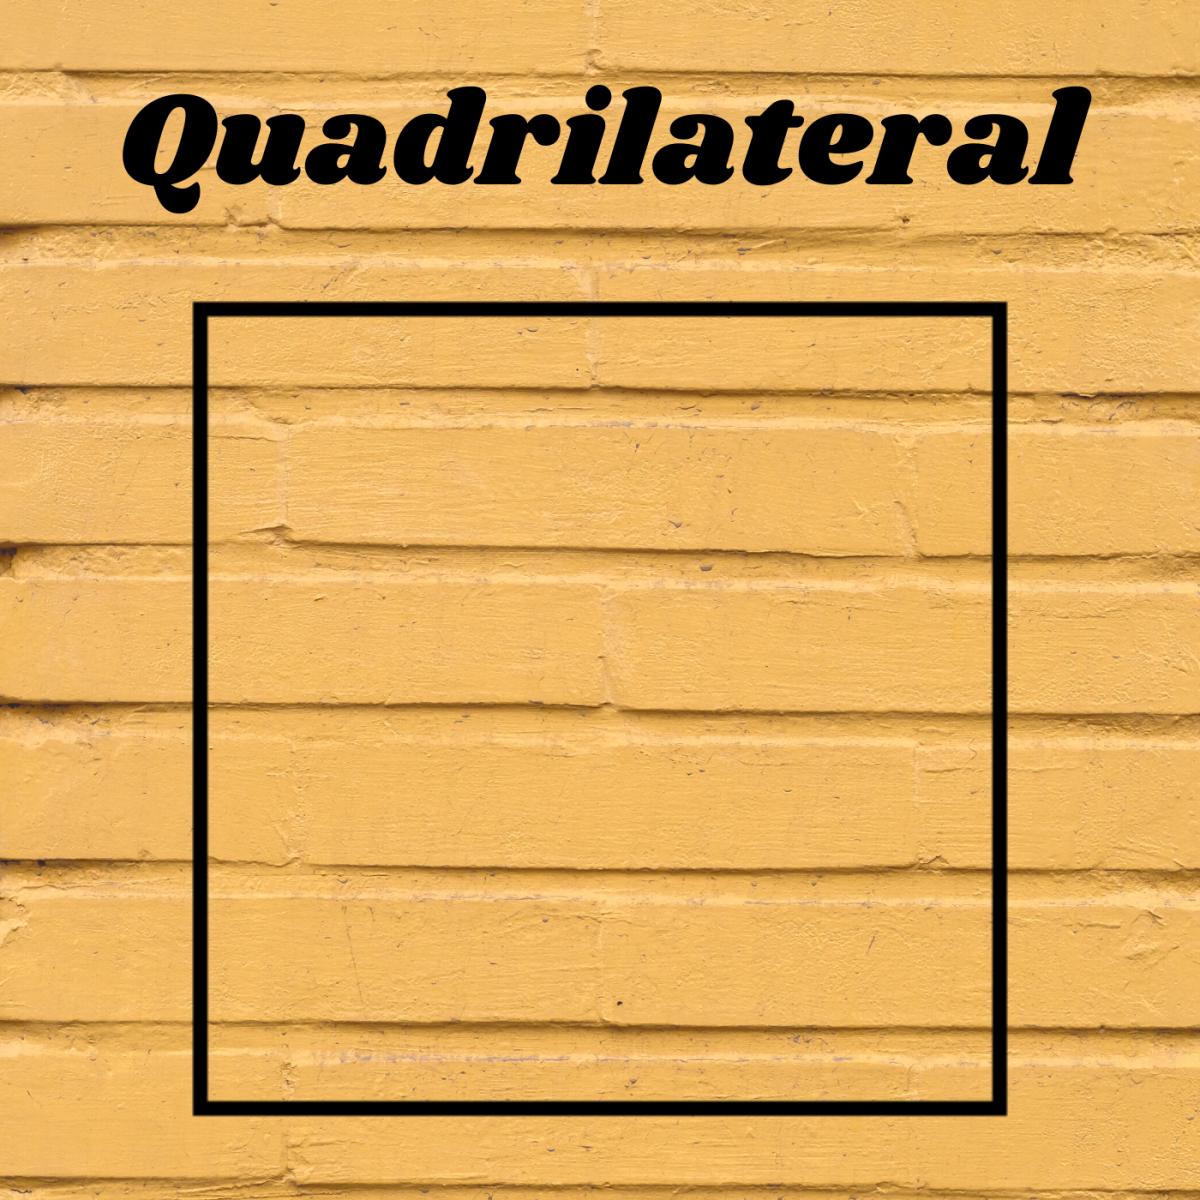 Quadrilaterals have four sides.